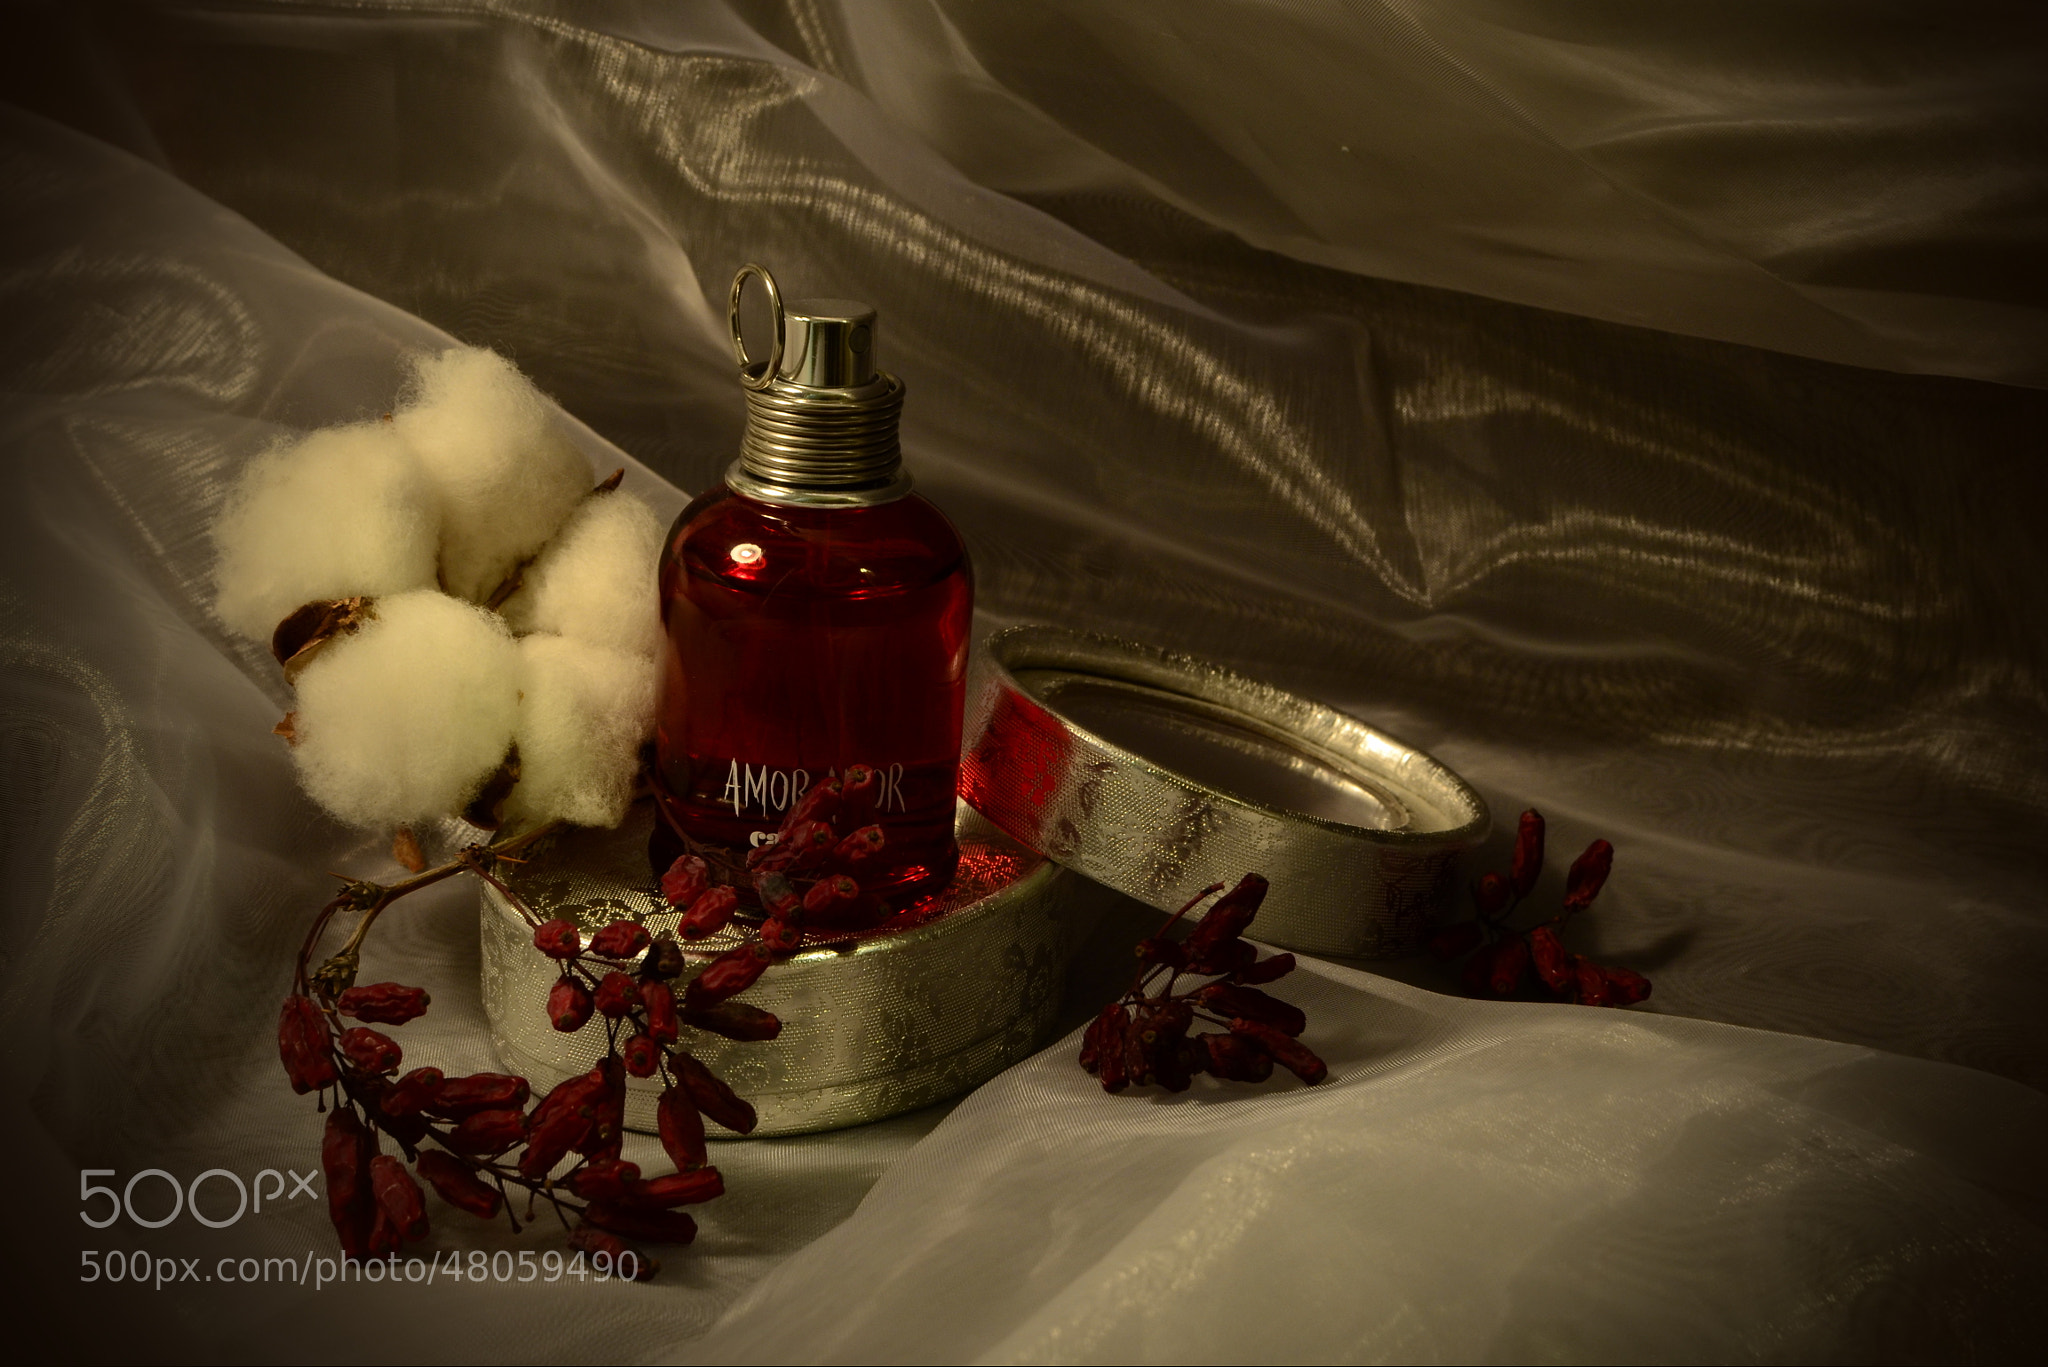 Photograph Amor Amor by Delia Cozma on 500px